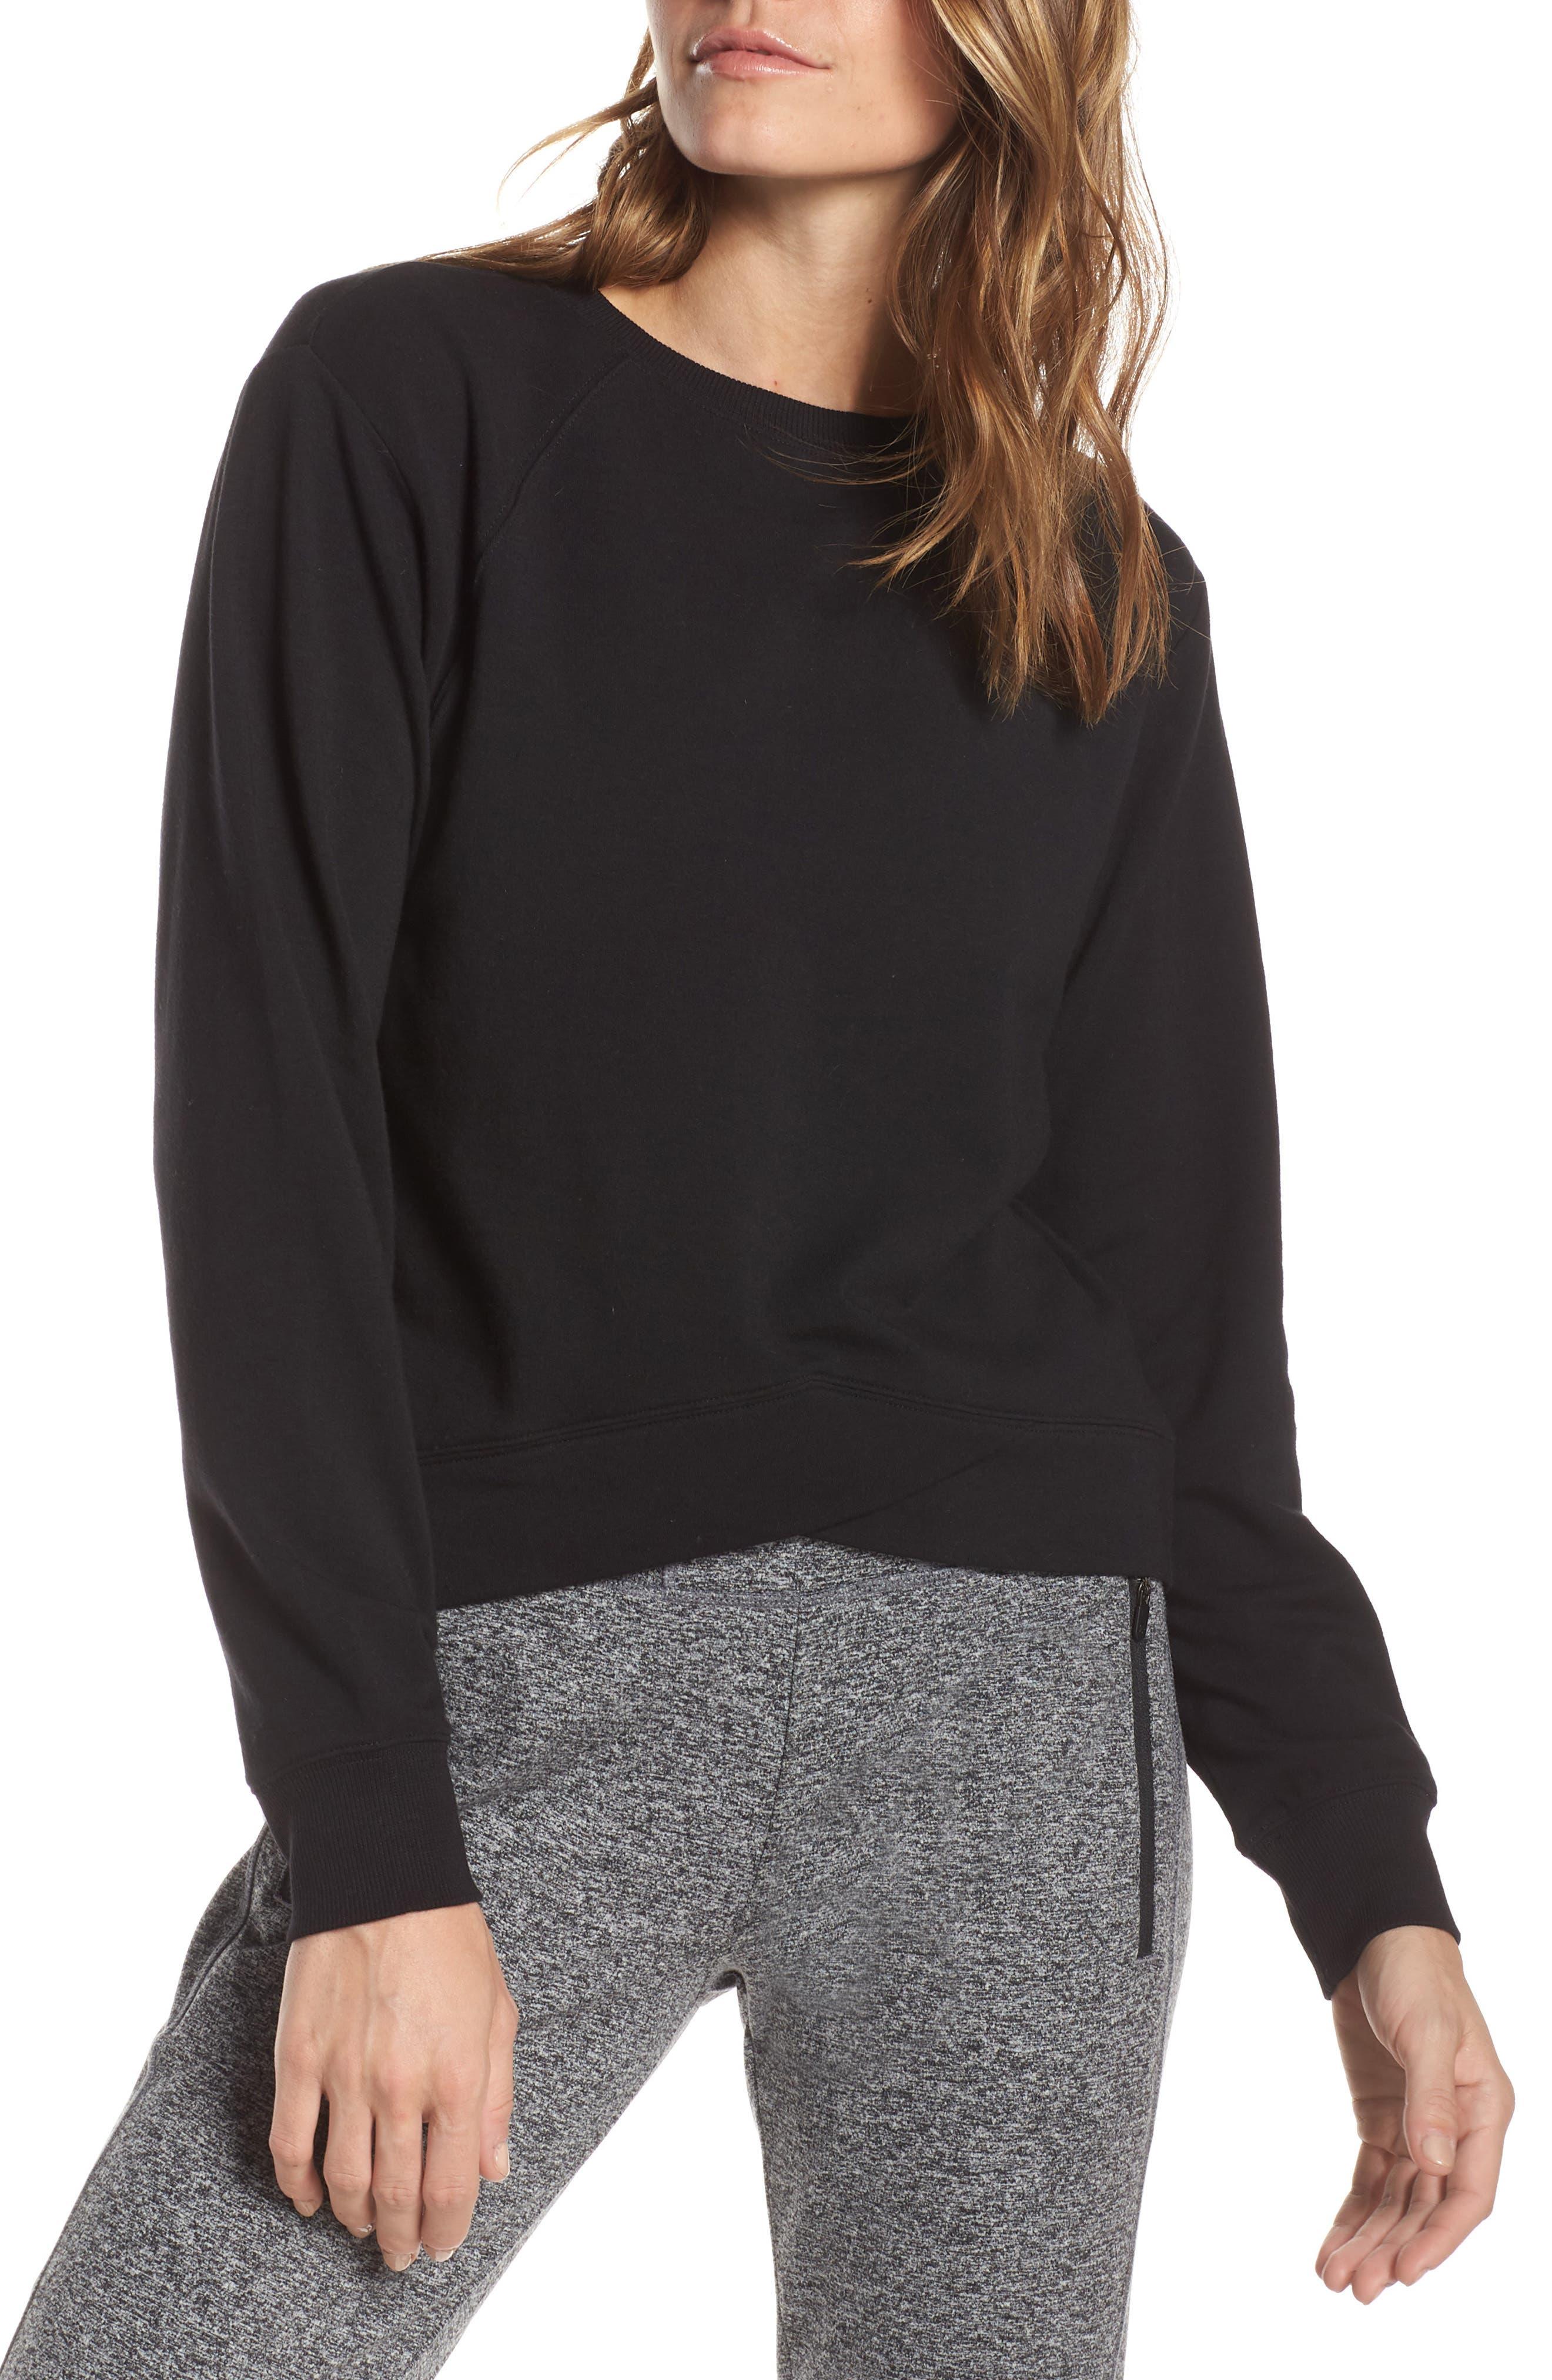 Uplifted Sweatshirt,                             Main thumbnail 1, color,                             001